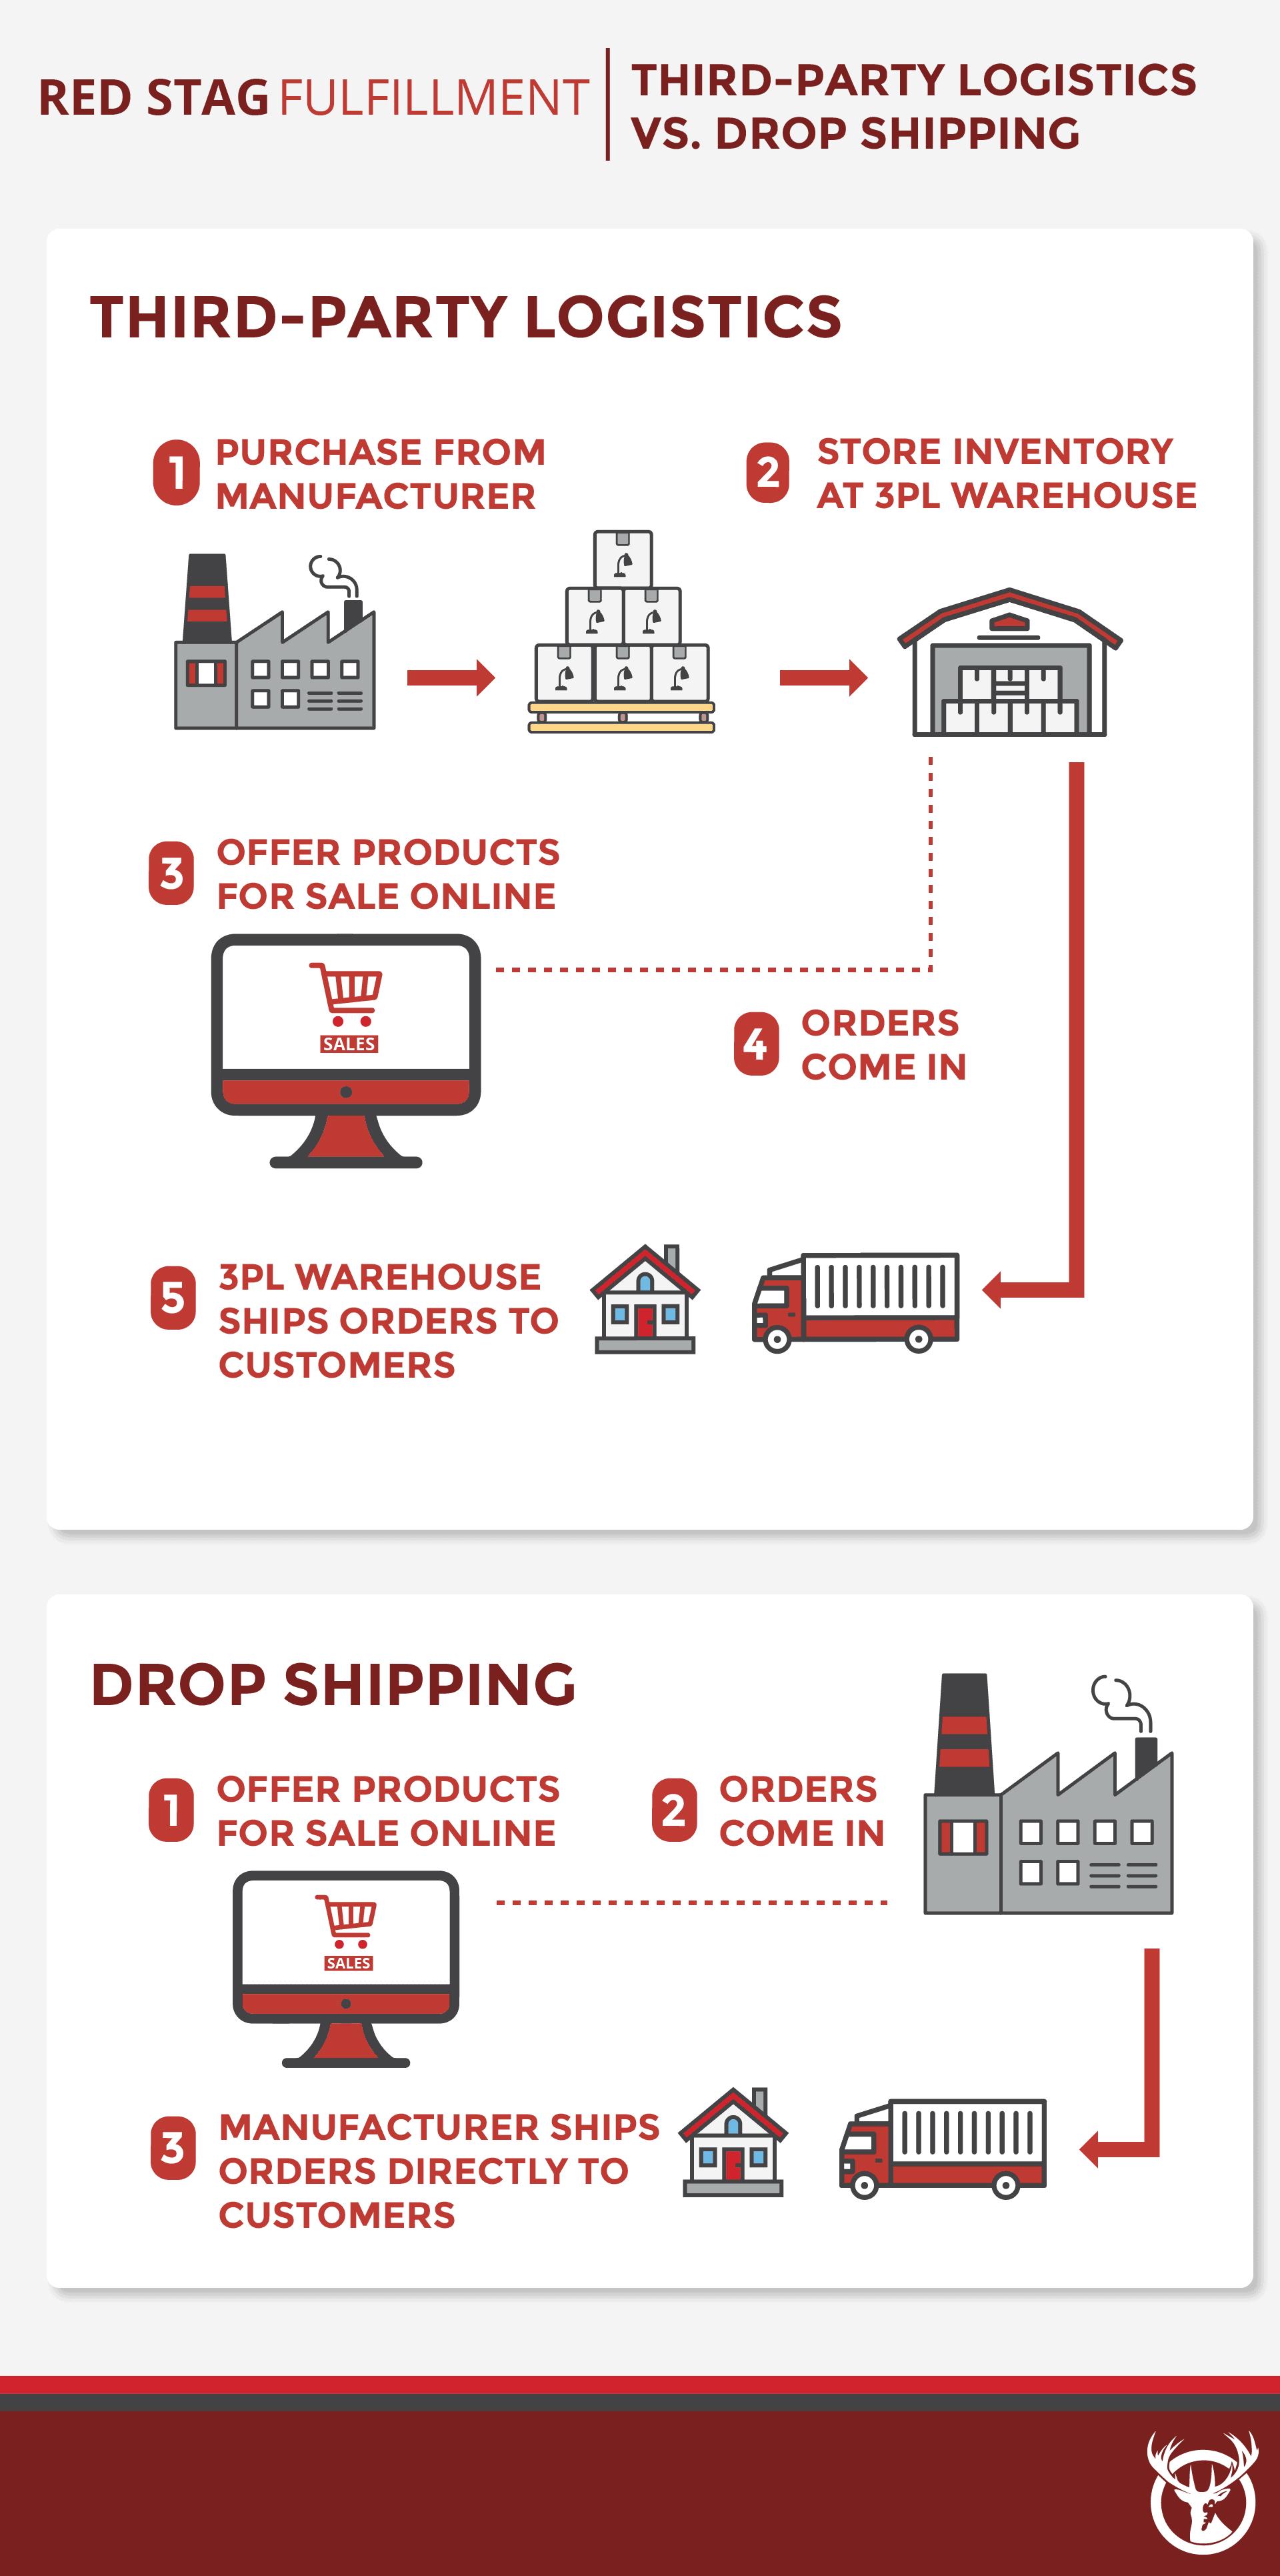 3PL vs. Drop Shipping